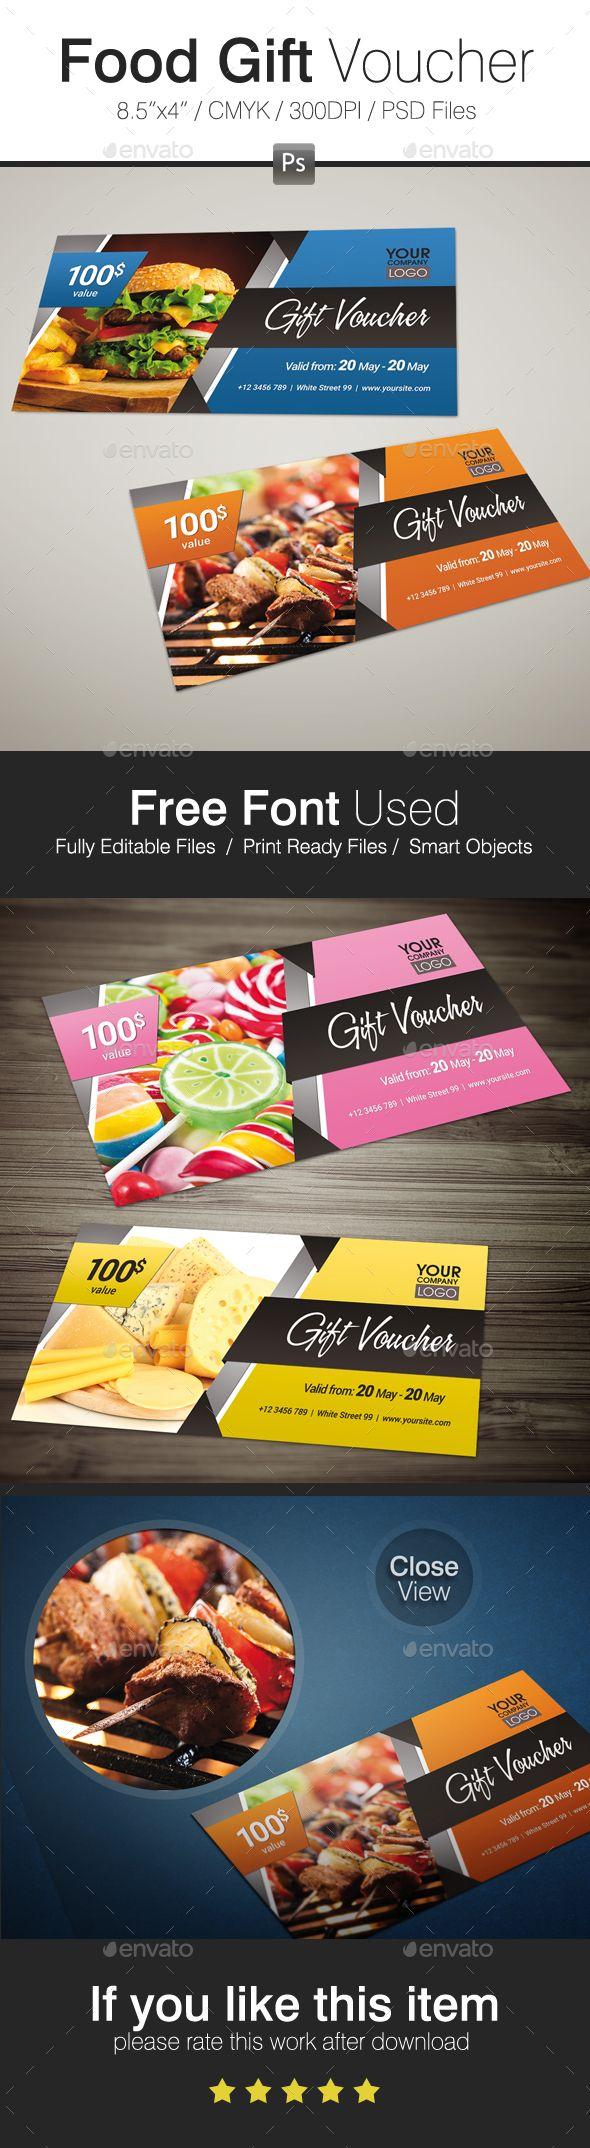 33 best gift voucher templates images on pinterest fonts food gift voucher design download httpsgraphicriveritem xflitez Image collections